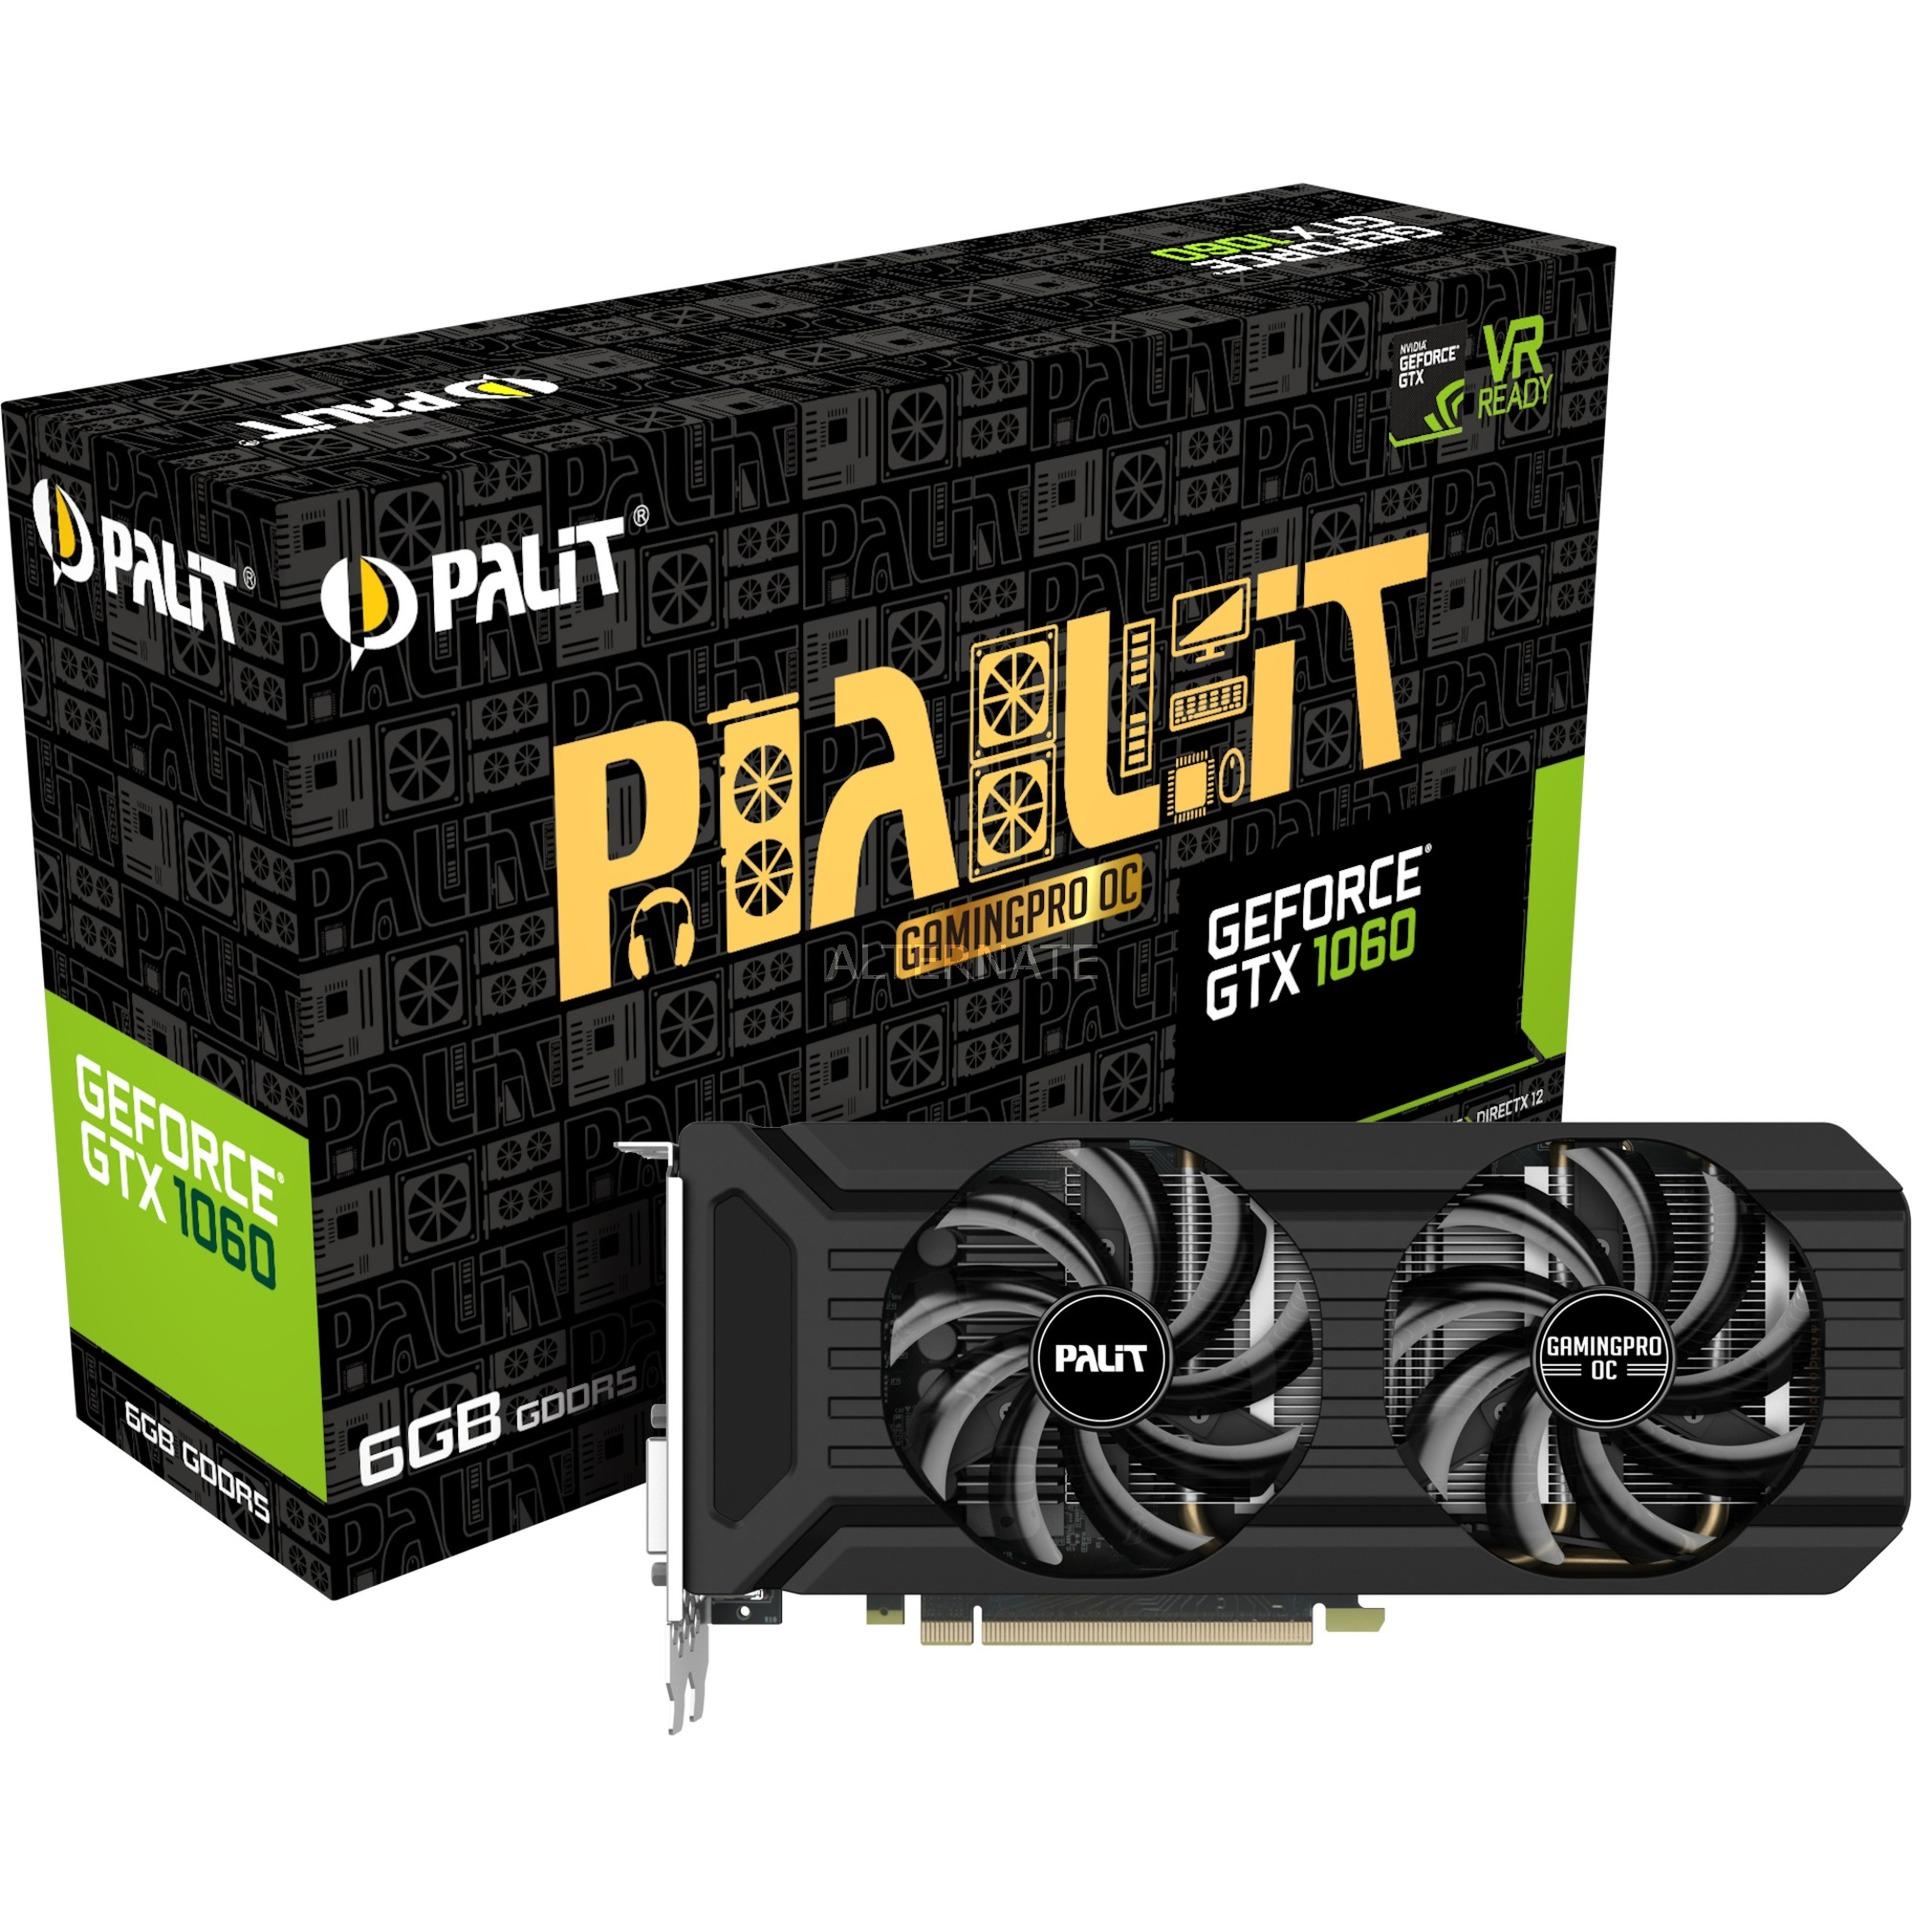 GeForce GTX 1060 GamingPro OC, Tarjeta gráfica